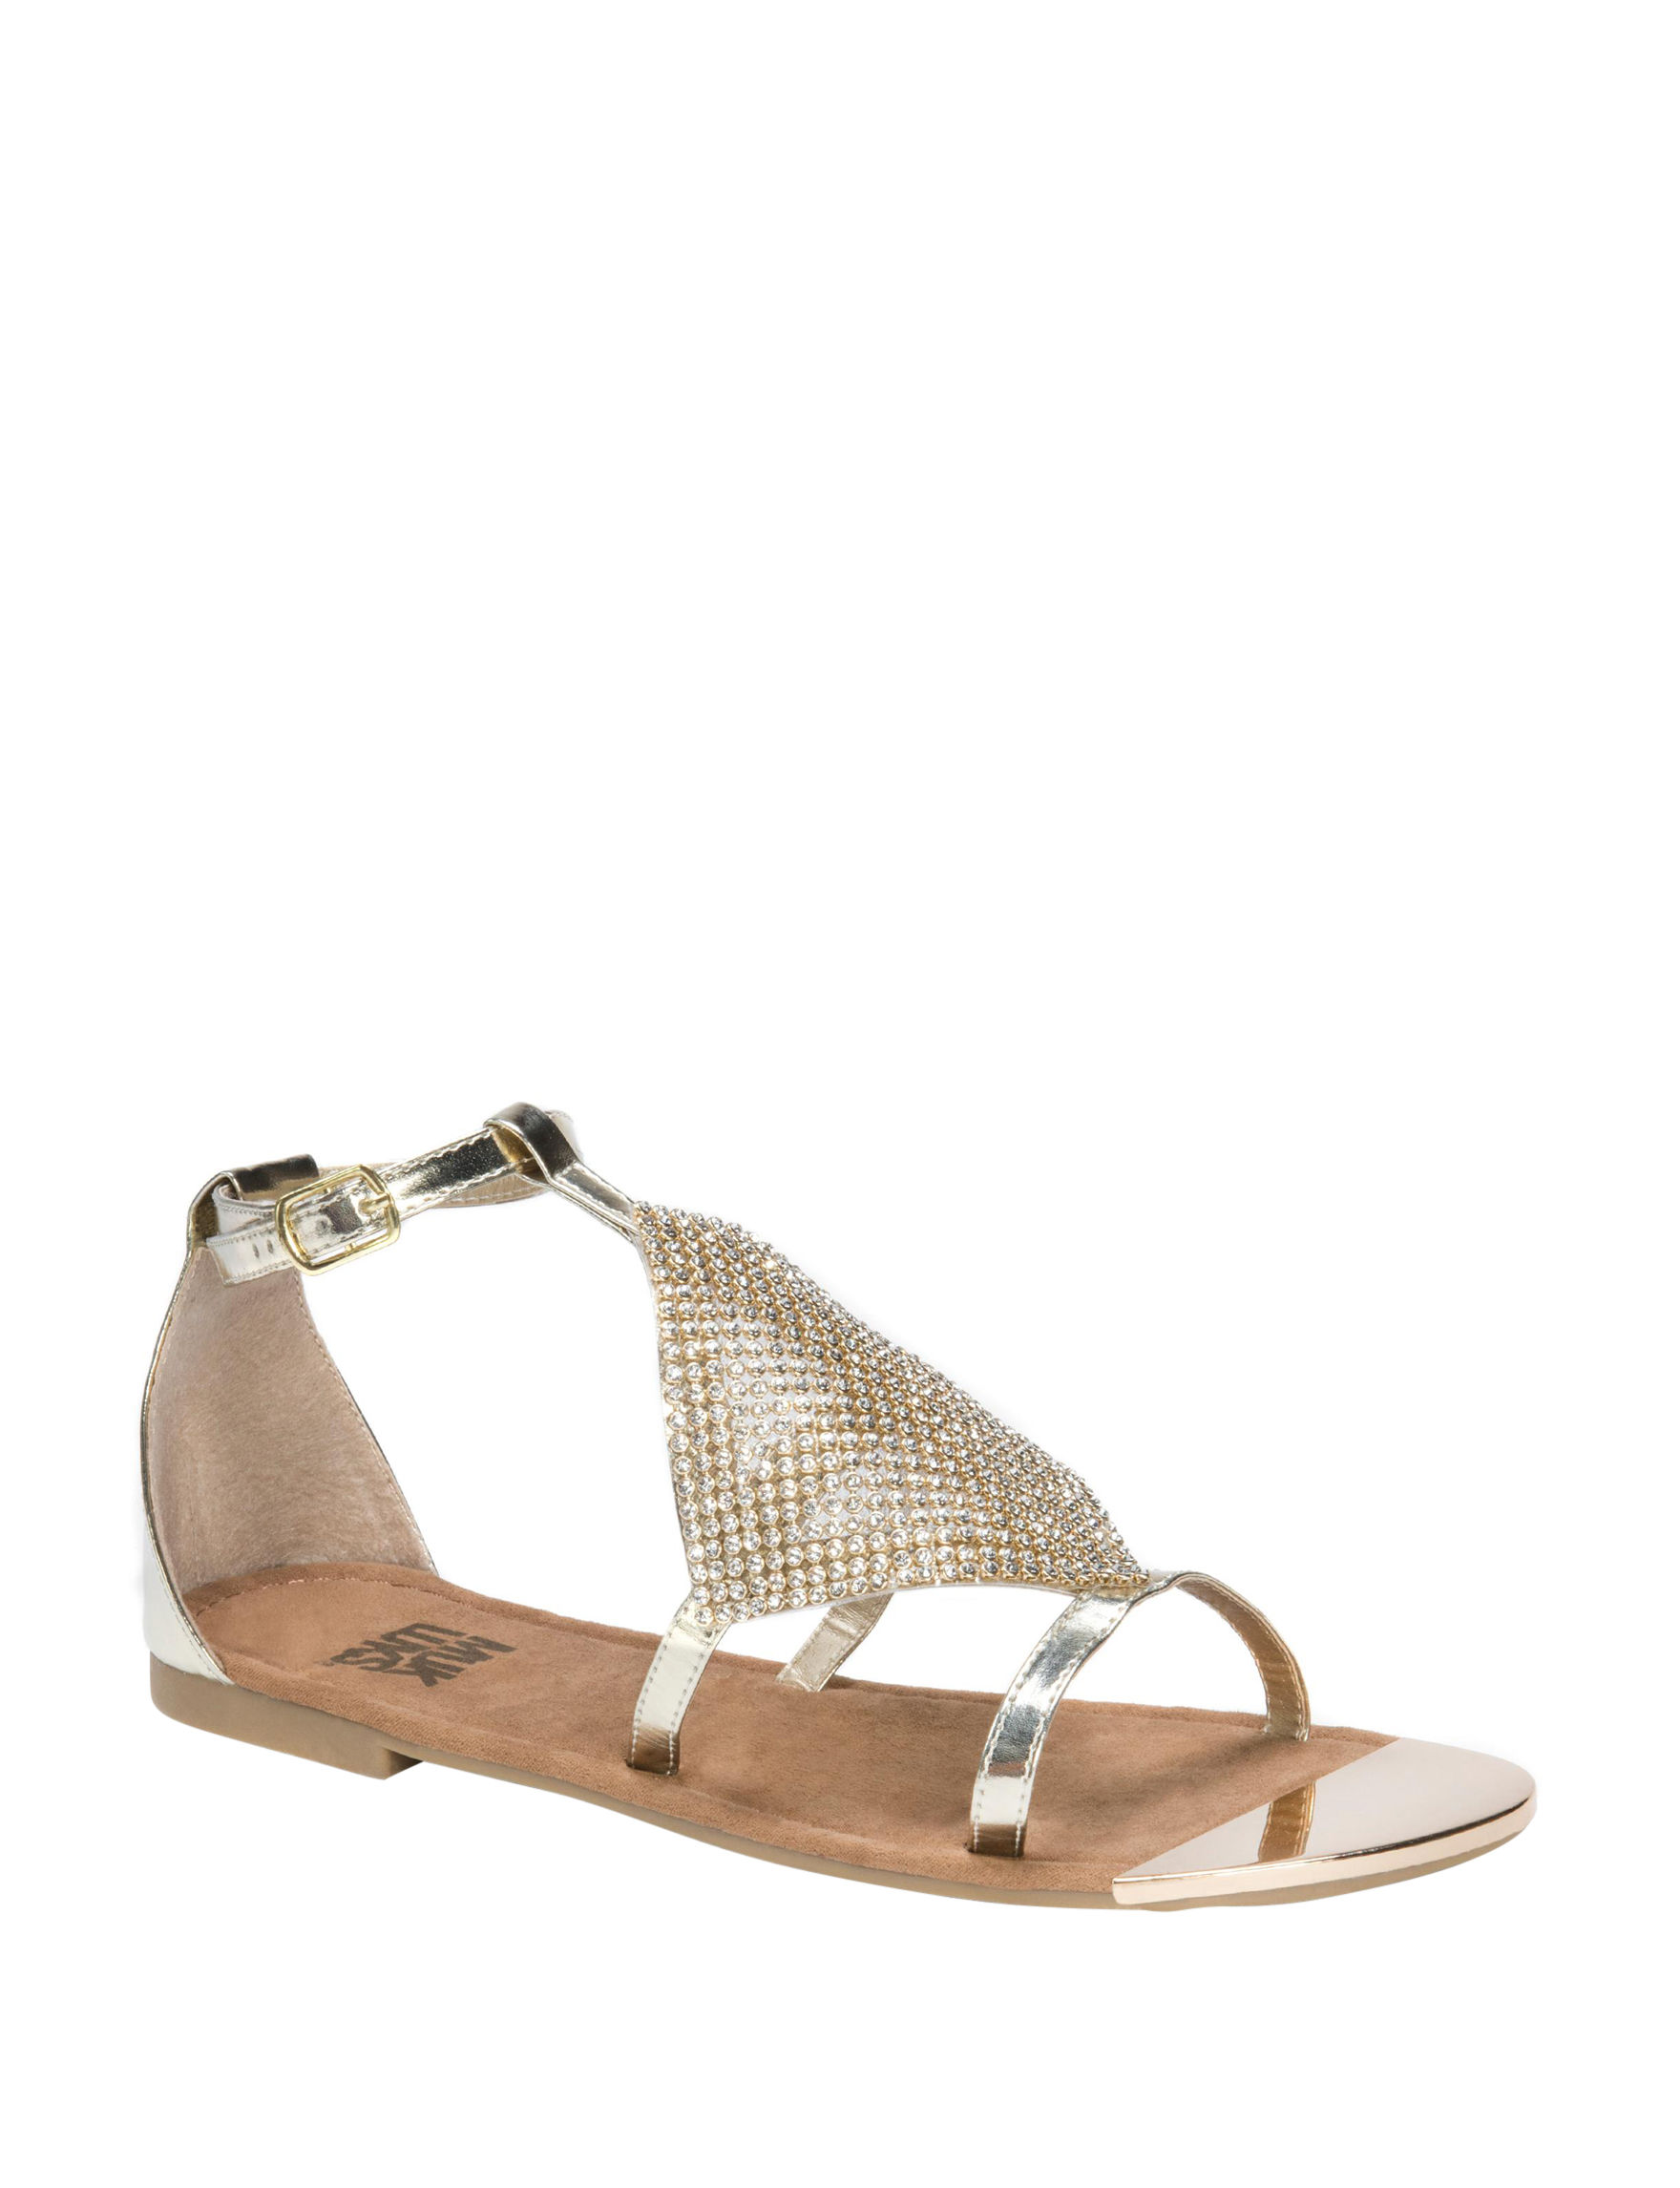 Muk Luks Gold Flat Sandals Gladiators